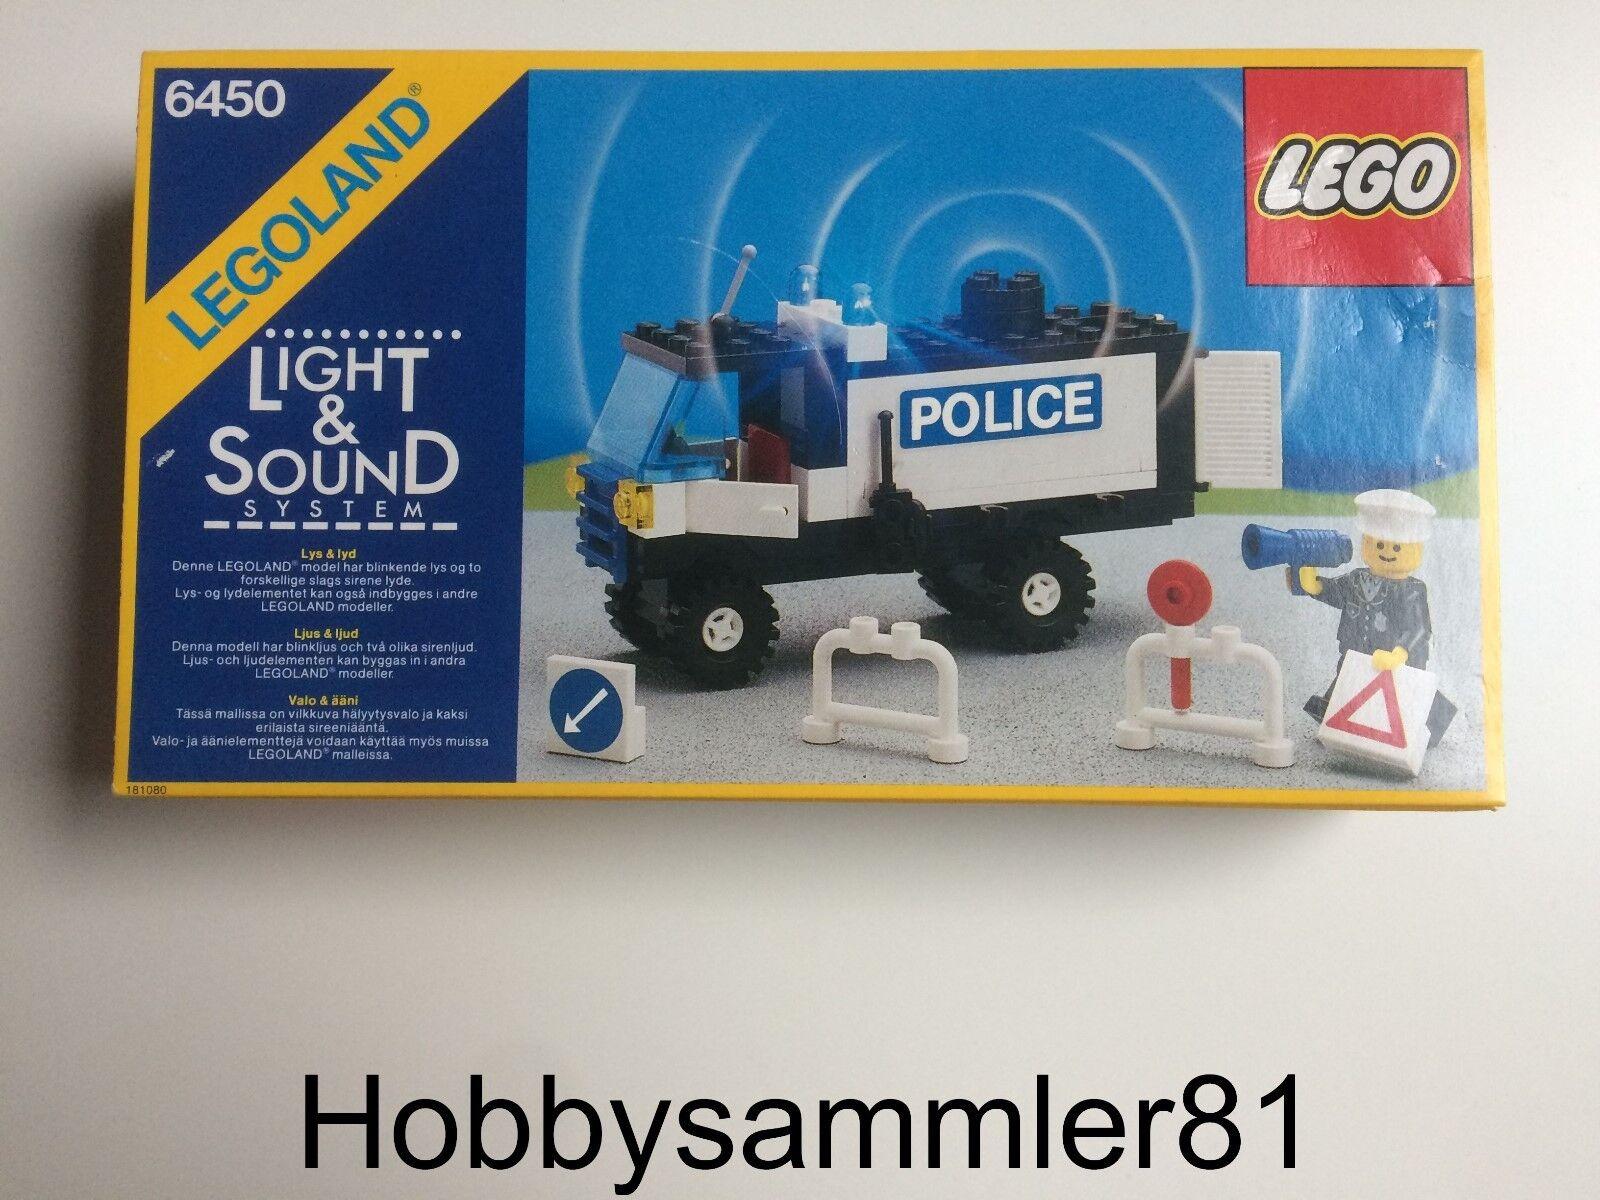 Lego® 6450 Legoland Mobile Police Truck   Polizeieinsatzfahrzeug   Neu und OVP